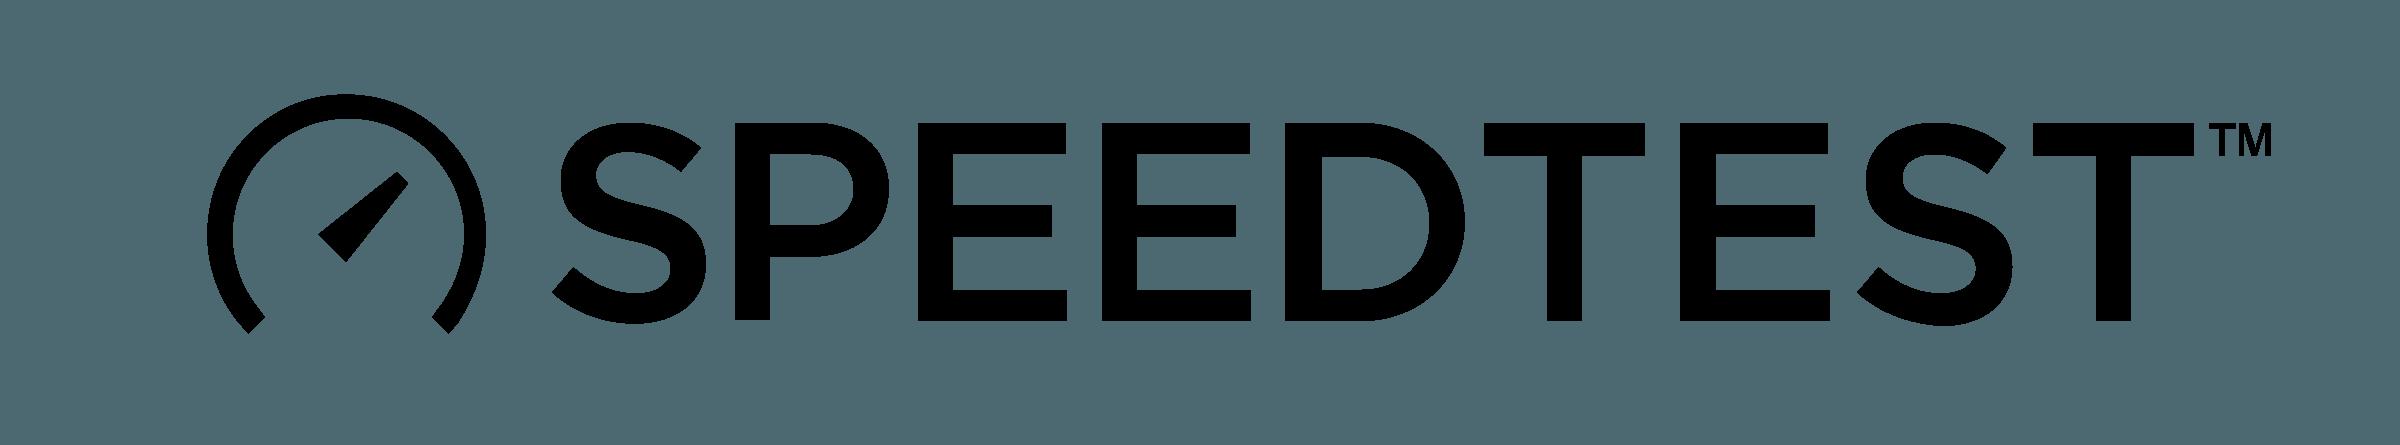 Wnet | Internet Service Provider